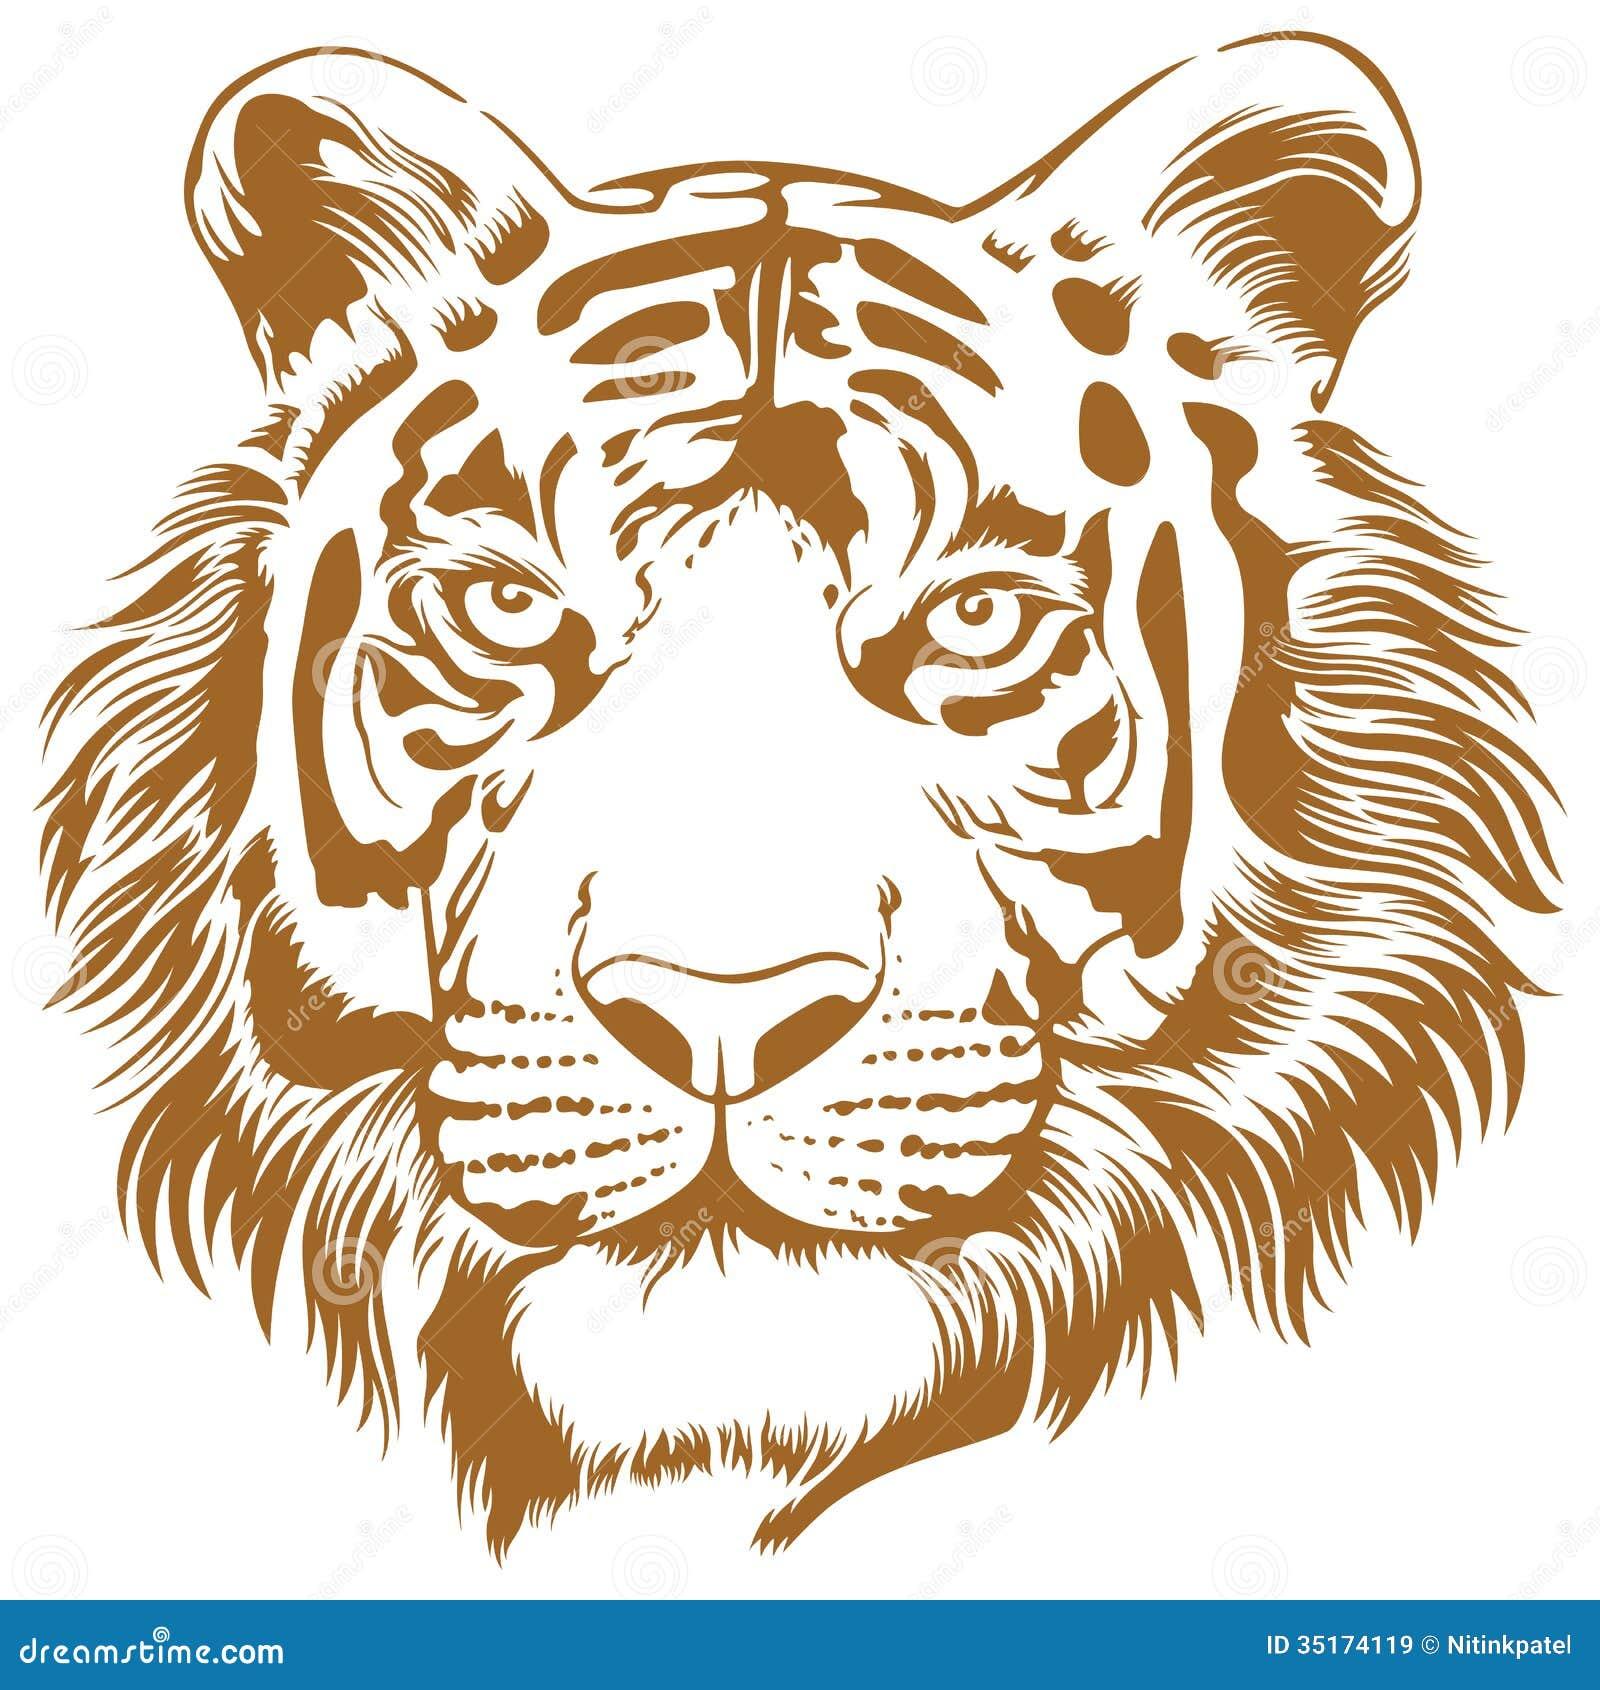 Rasta lion head stencil - photo#16